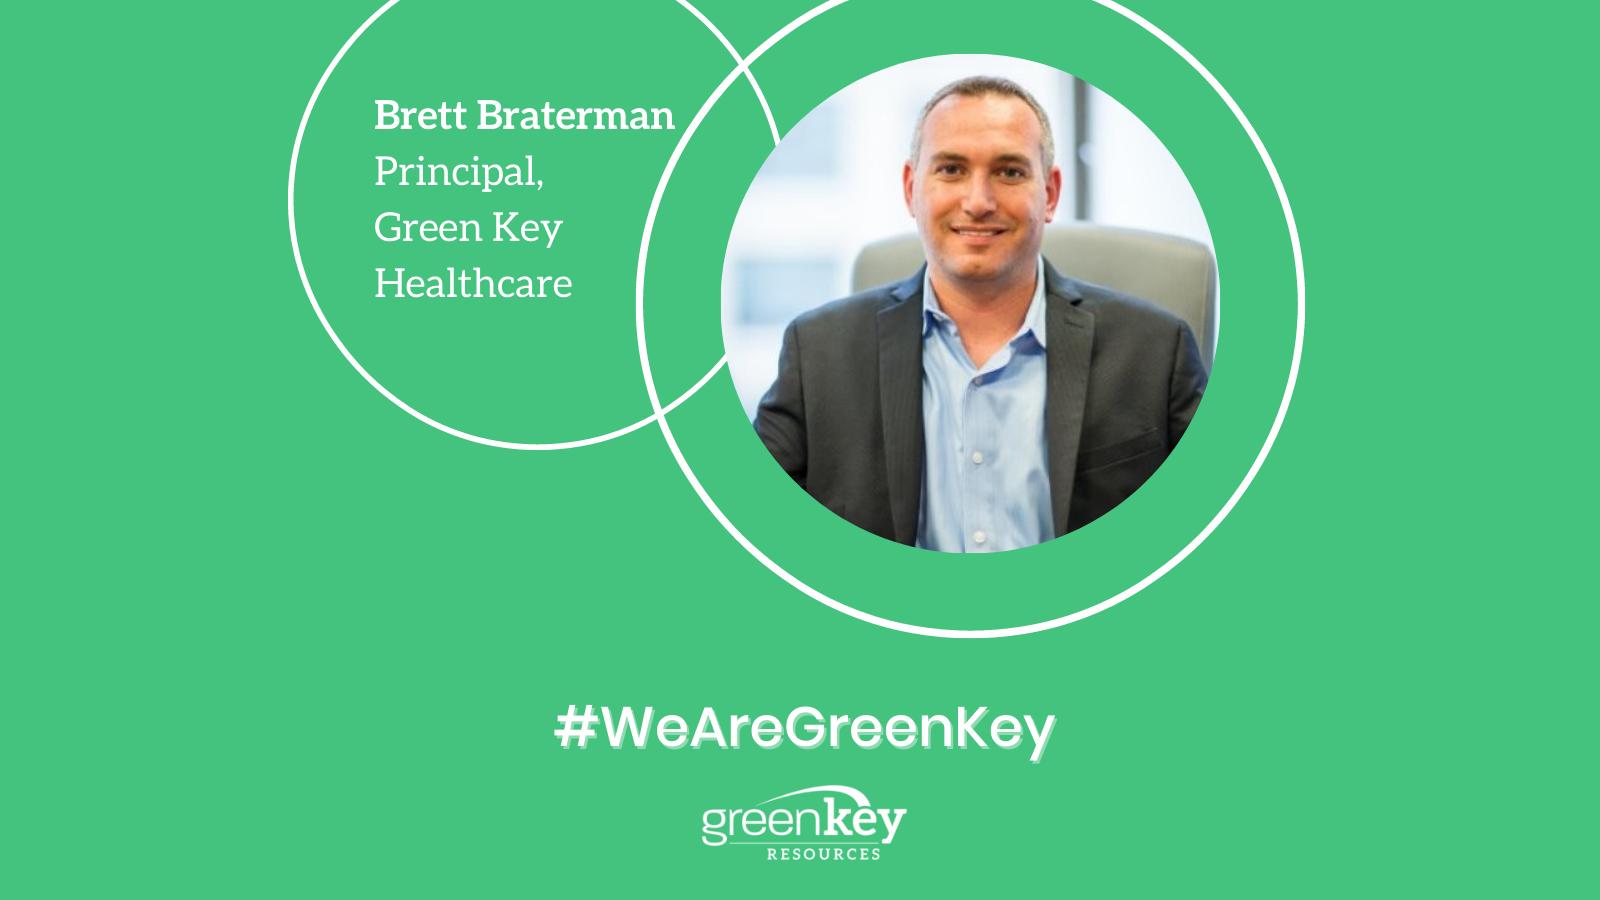 Brett Braterman - Principal, Green Key Healthcare